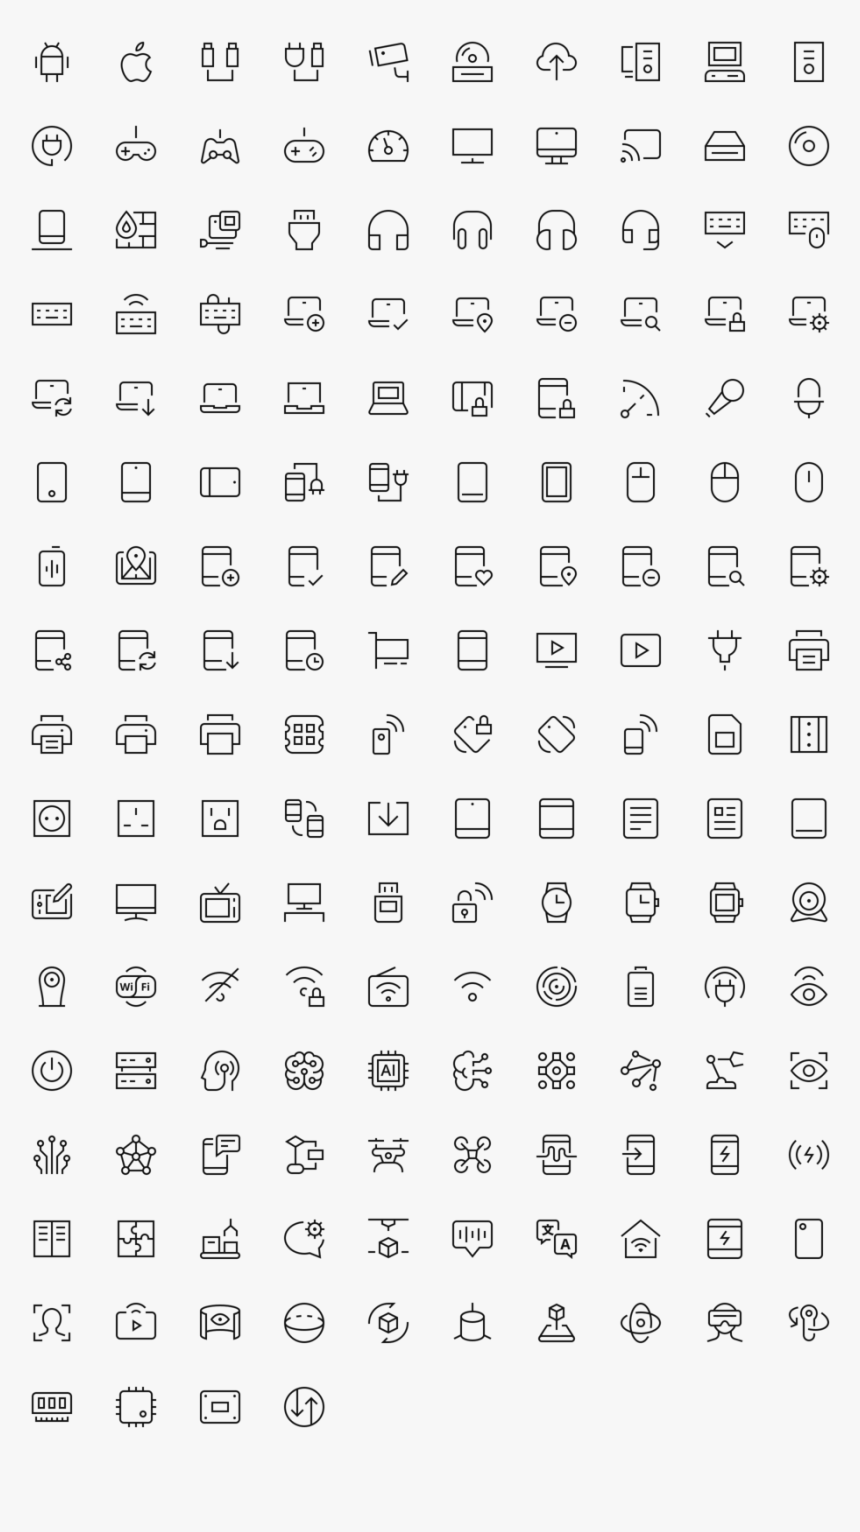 Icon Ui Free Download Png, Transparent Png, Free Download